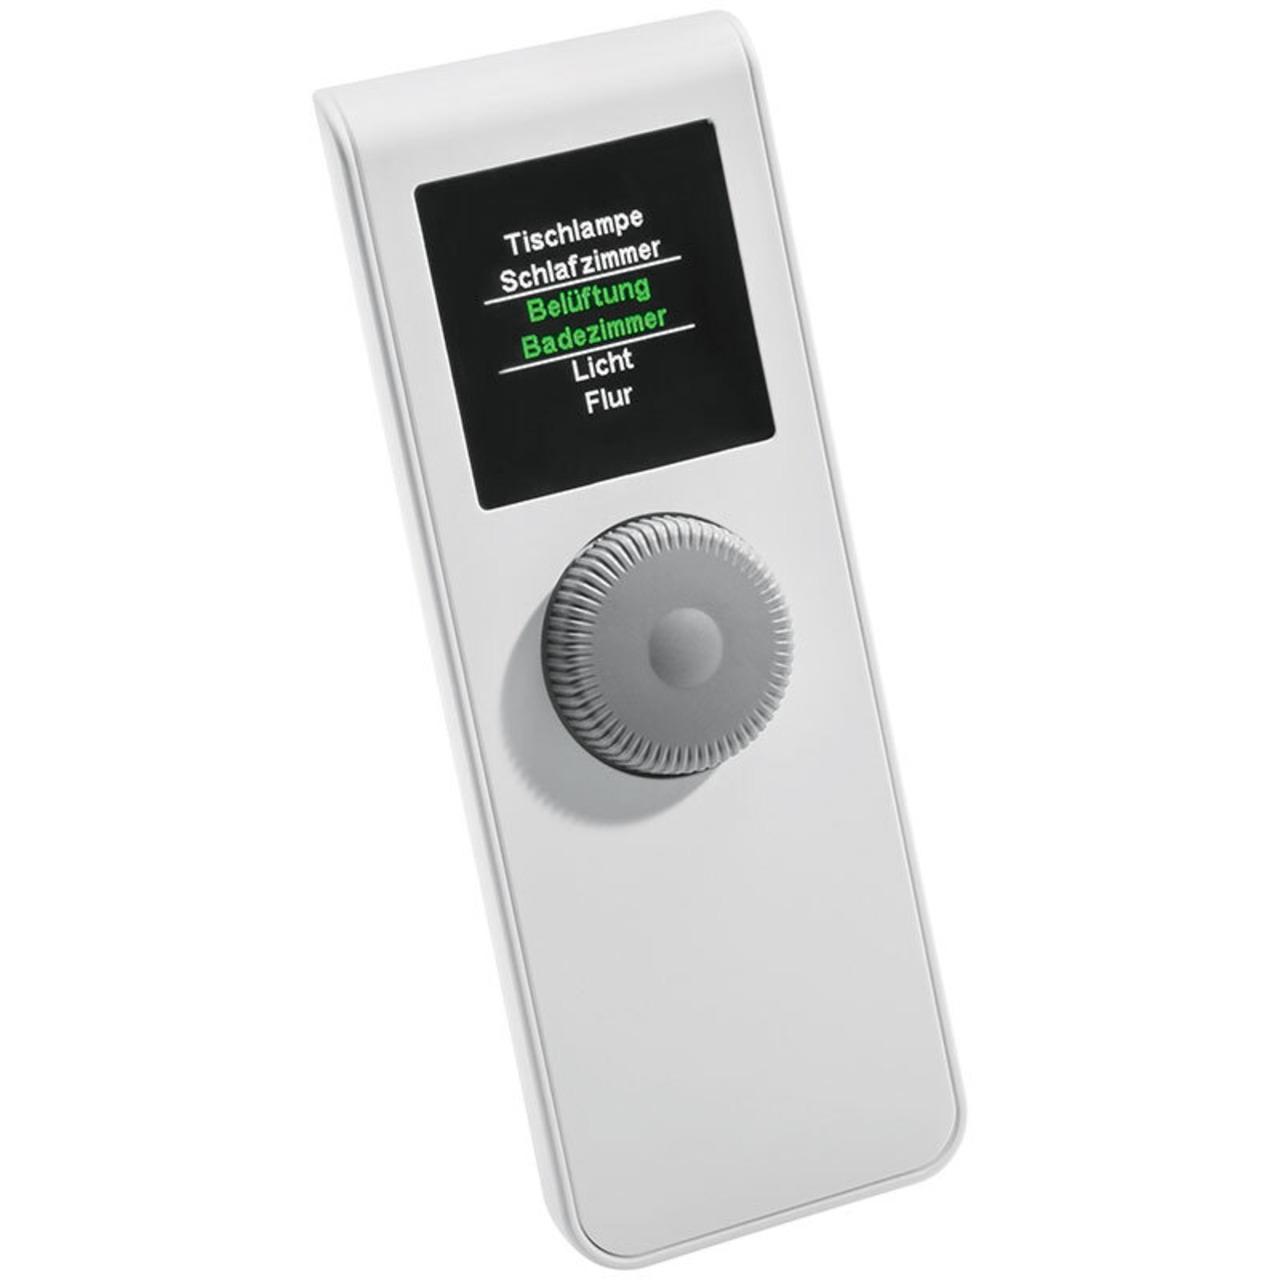 ELV Homematic Komplettbausatz Displayfernbedienung HM-RC-Dis-H-x-EU- für Smart Home - Hausuatomation